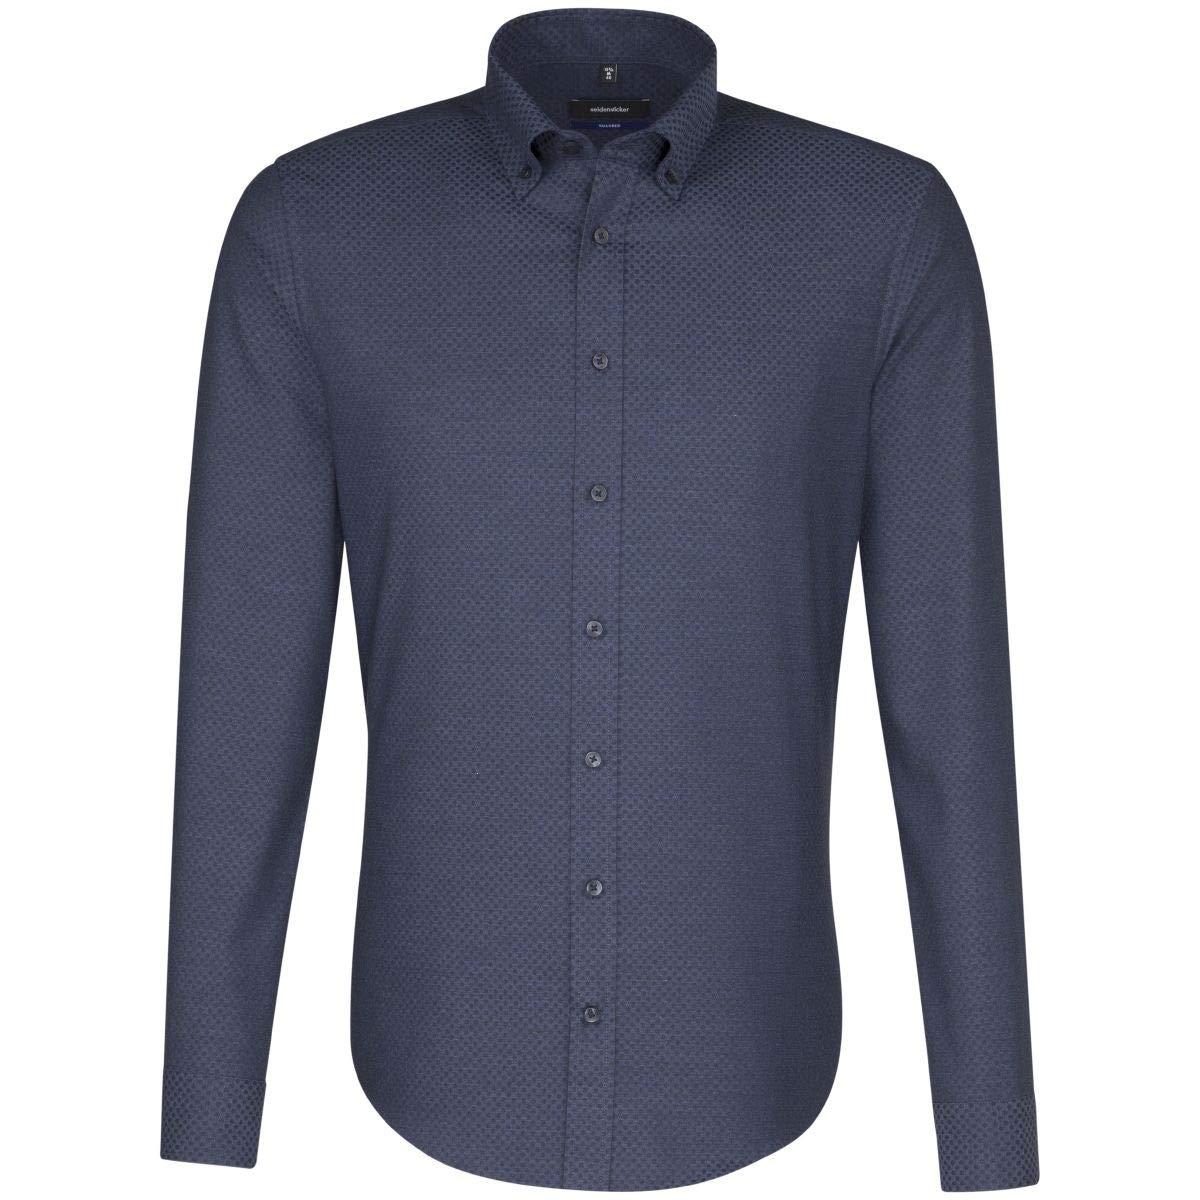 TALLA 40. Seidensticker Camisa Formal - Cuadrados - con Botones - Manga Larga - para Hombre